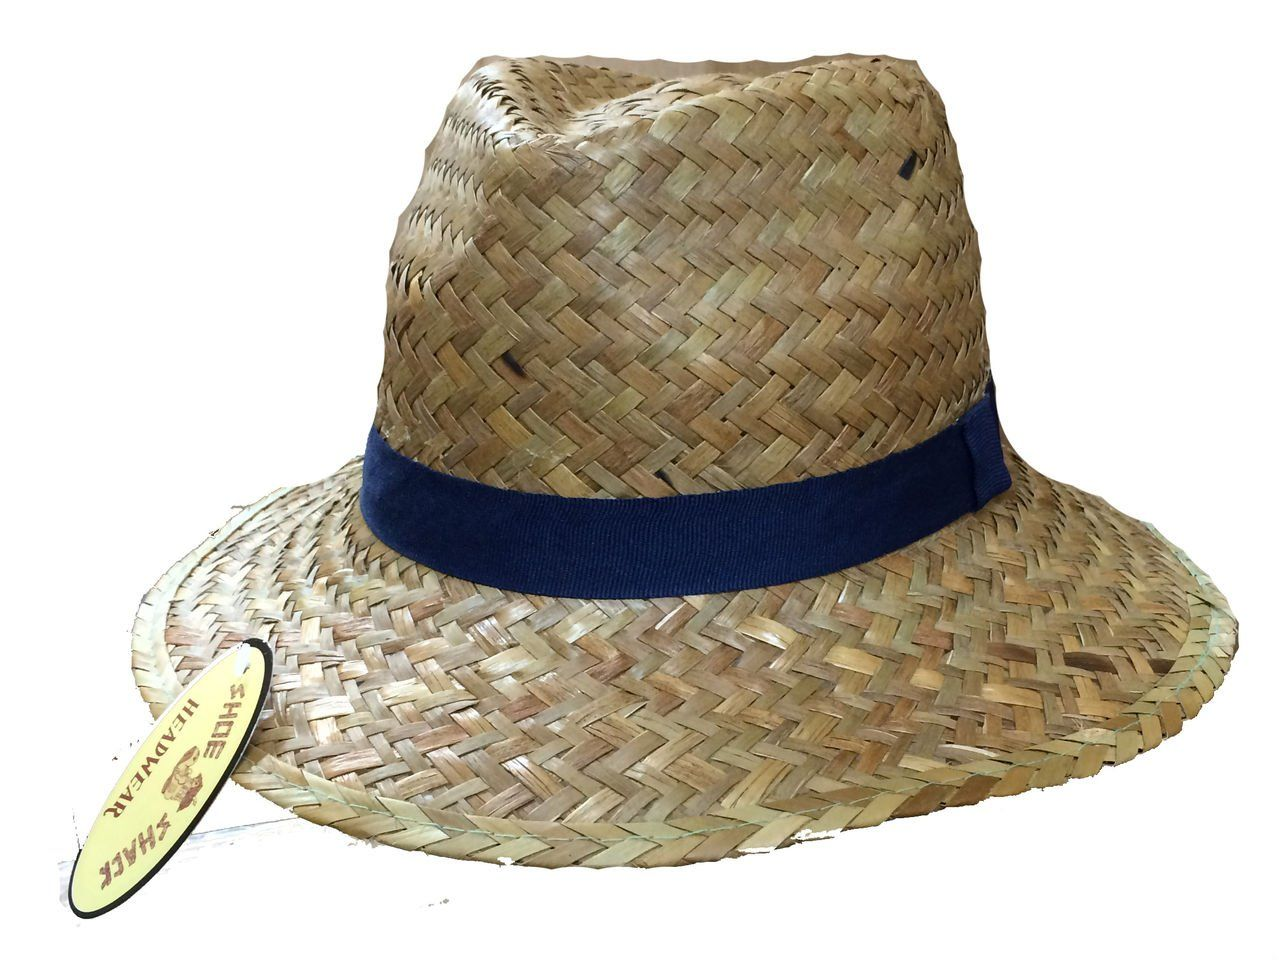 HM7100 - Large Garden Beach Summer Sun Straw Hat for Mens | Van Gogh ...